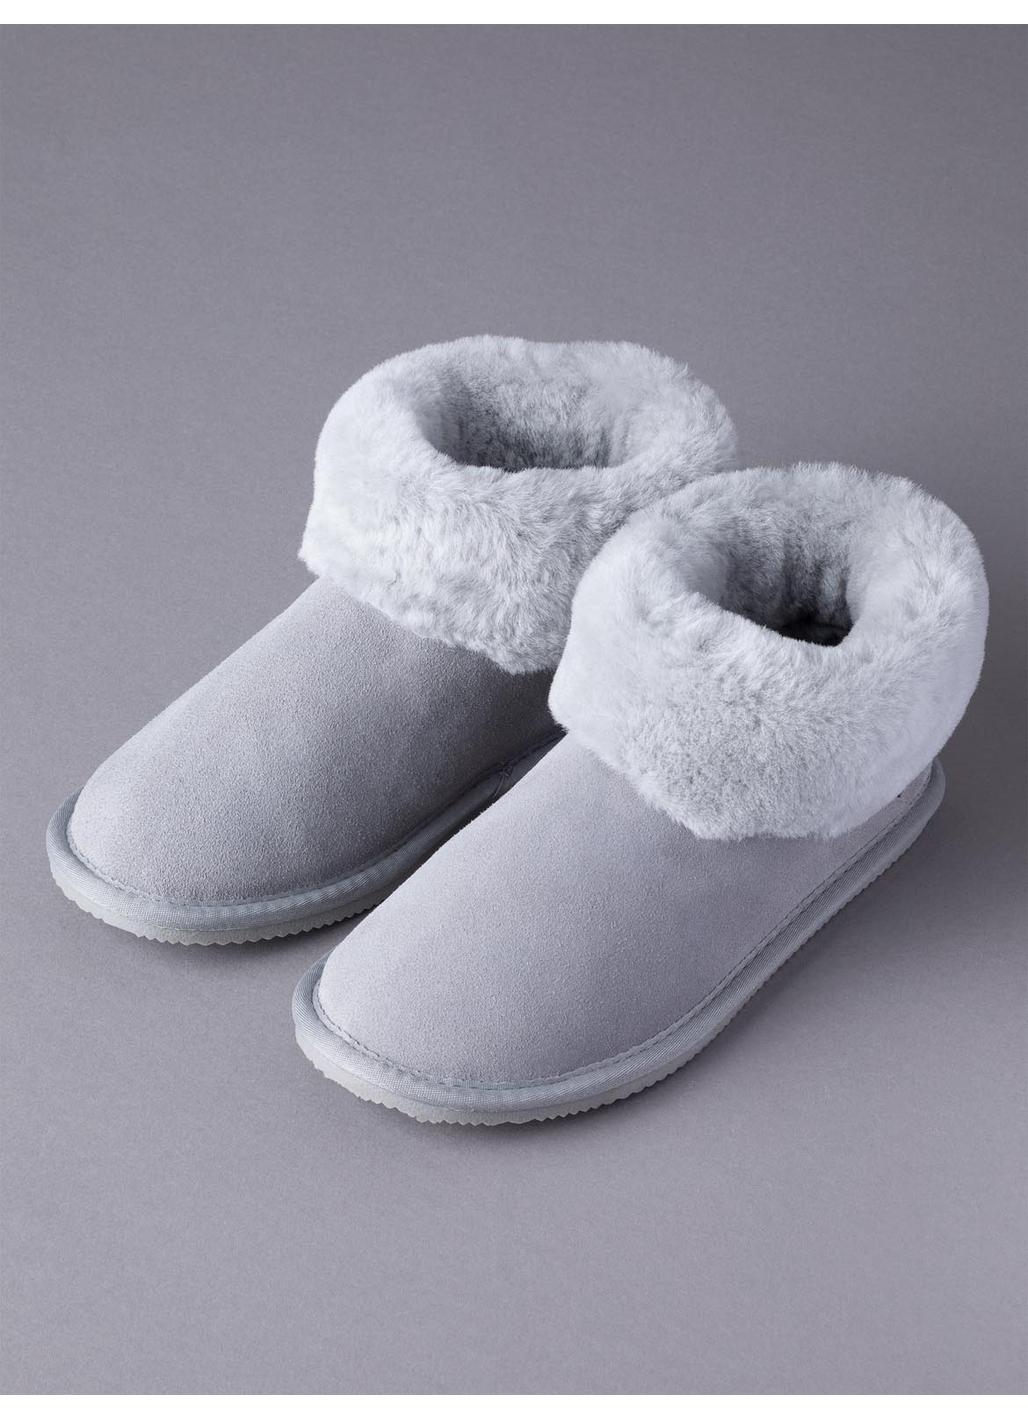 Ladies' Sheepskin Bootie Slippers in Light Grey